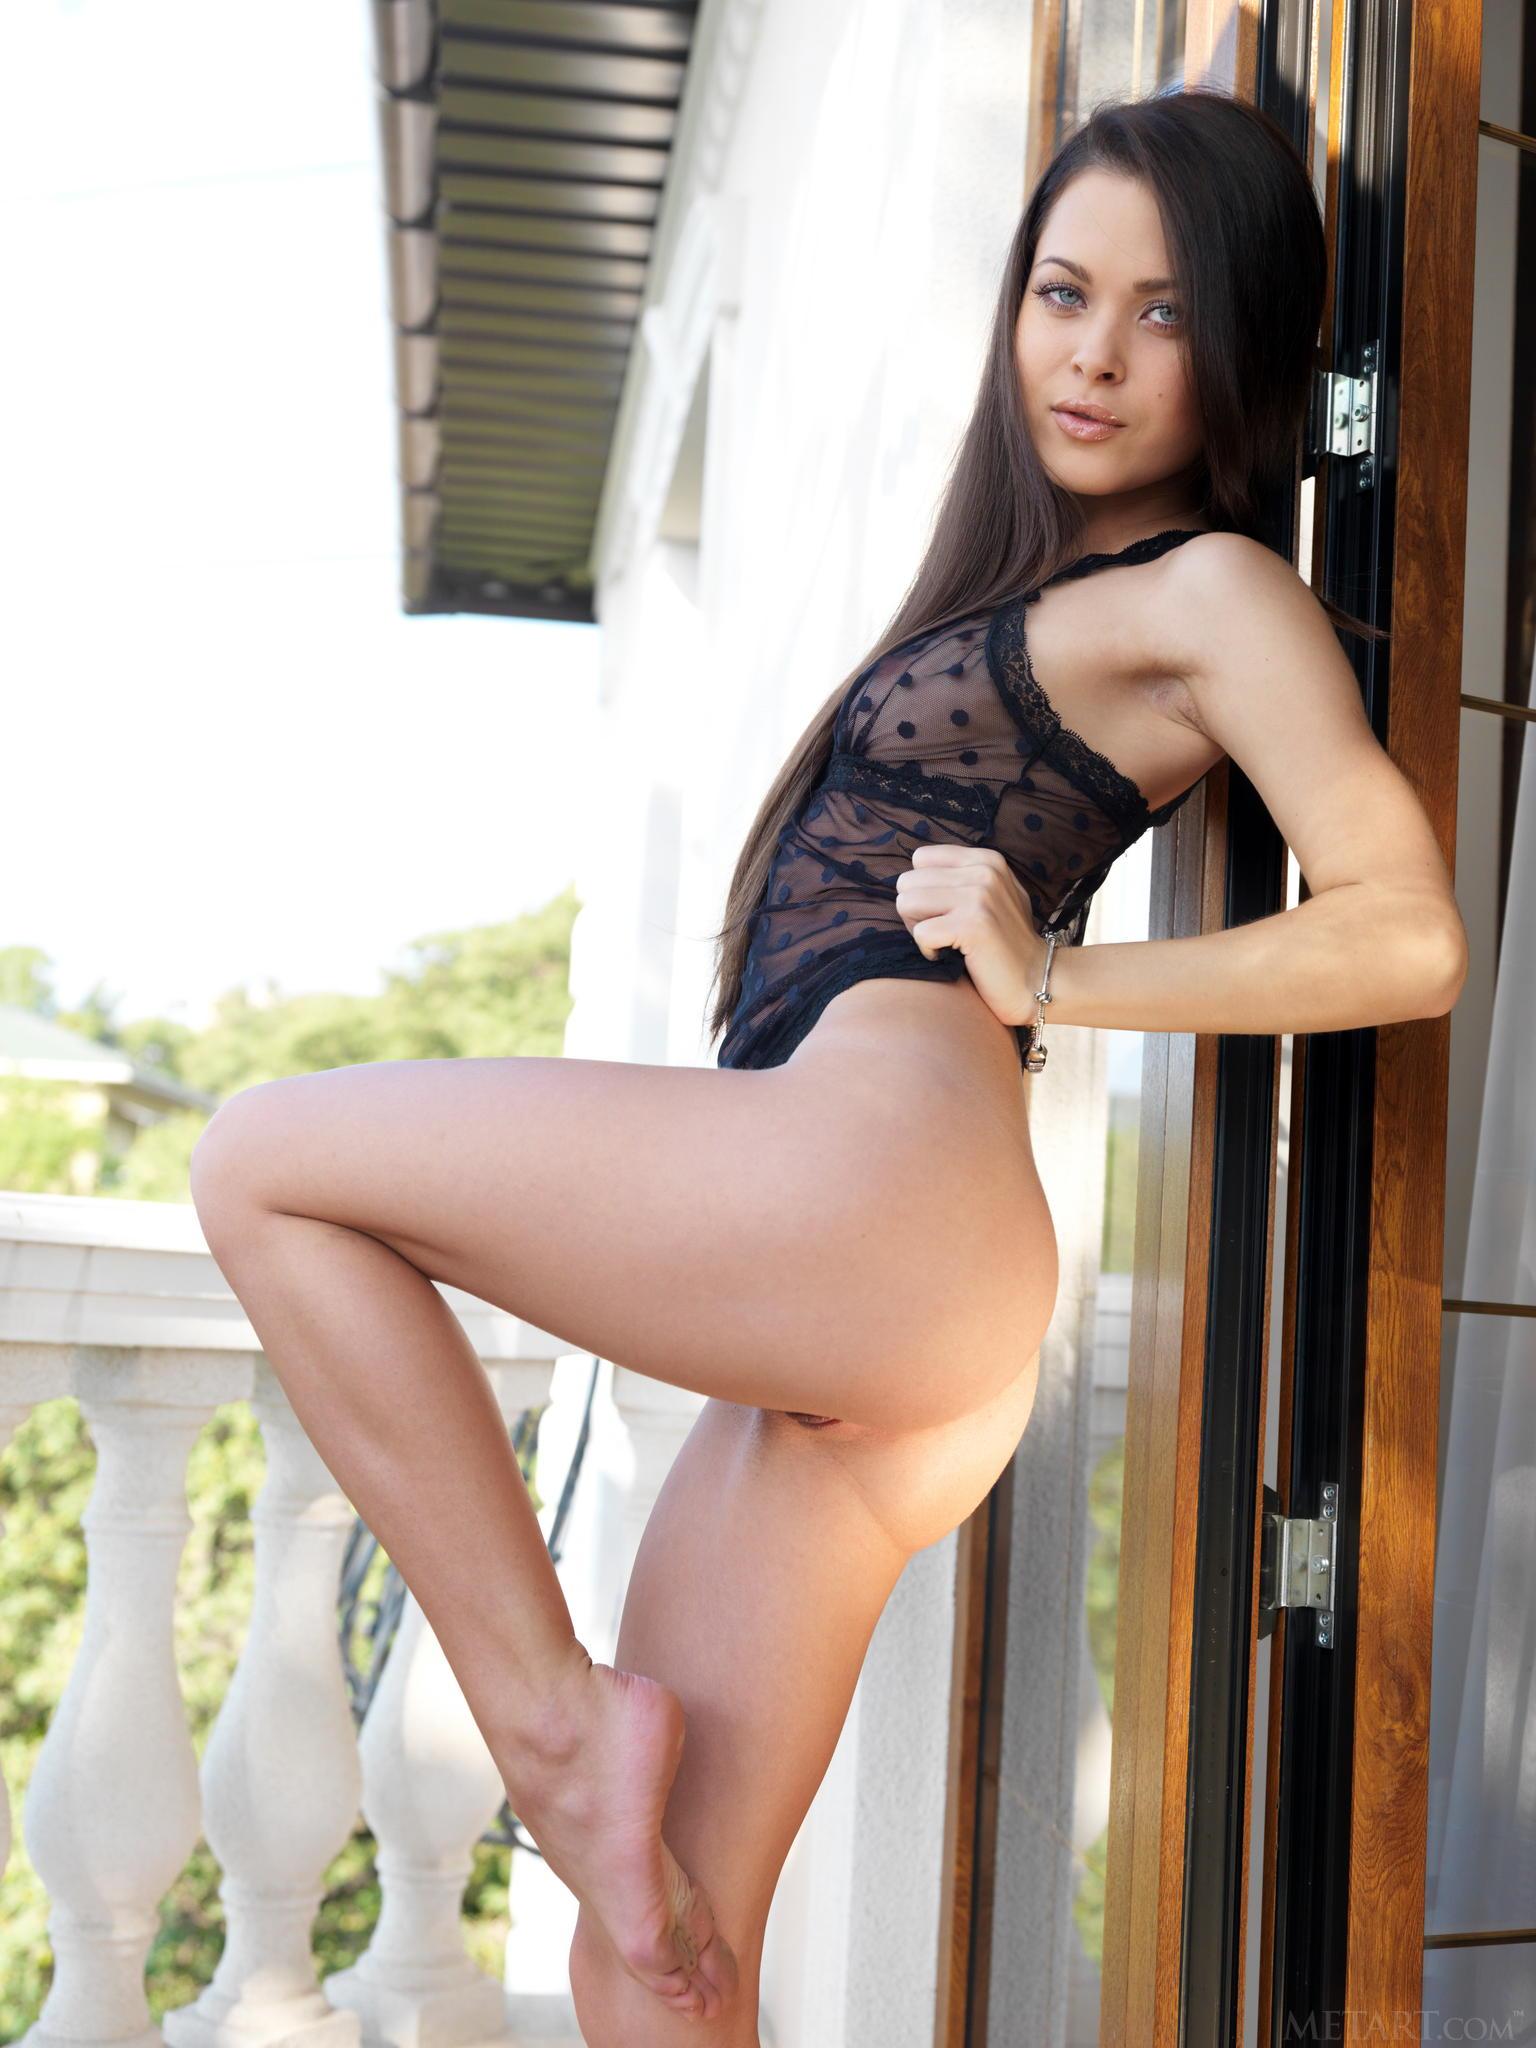 Amelie B - El arte de mostrar la conchita